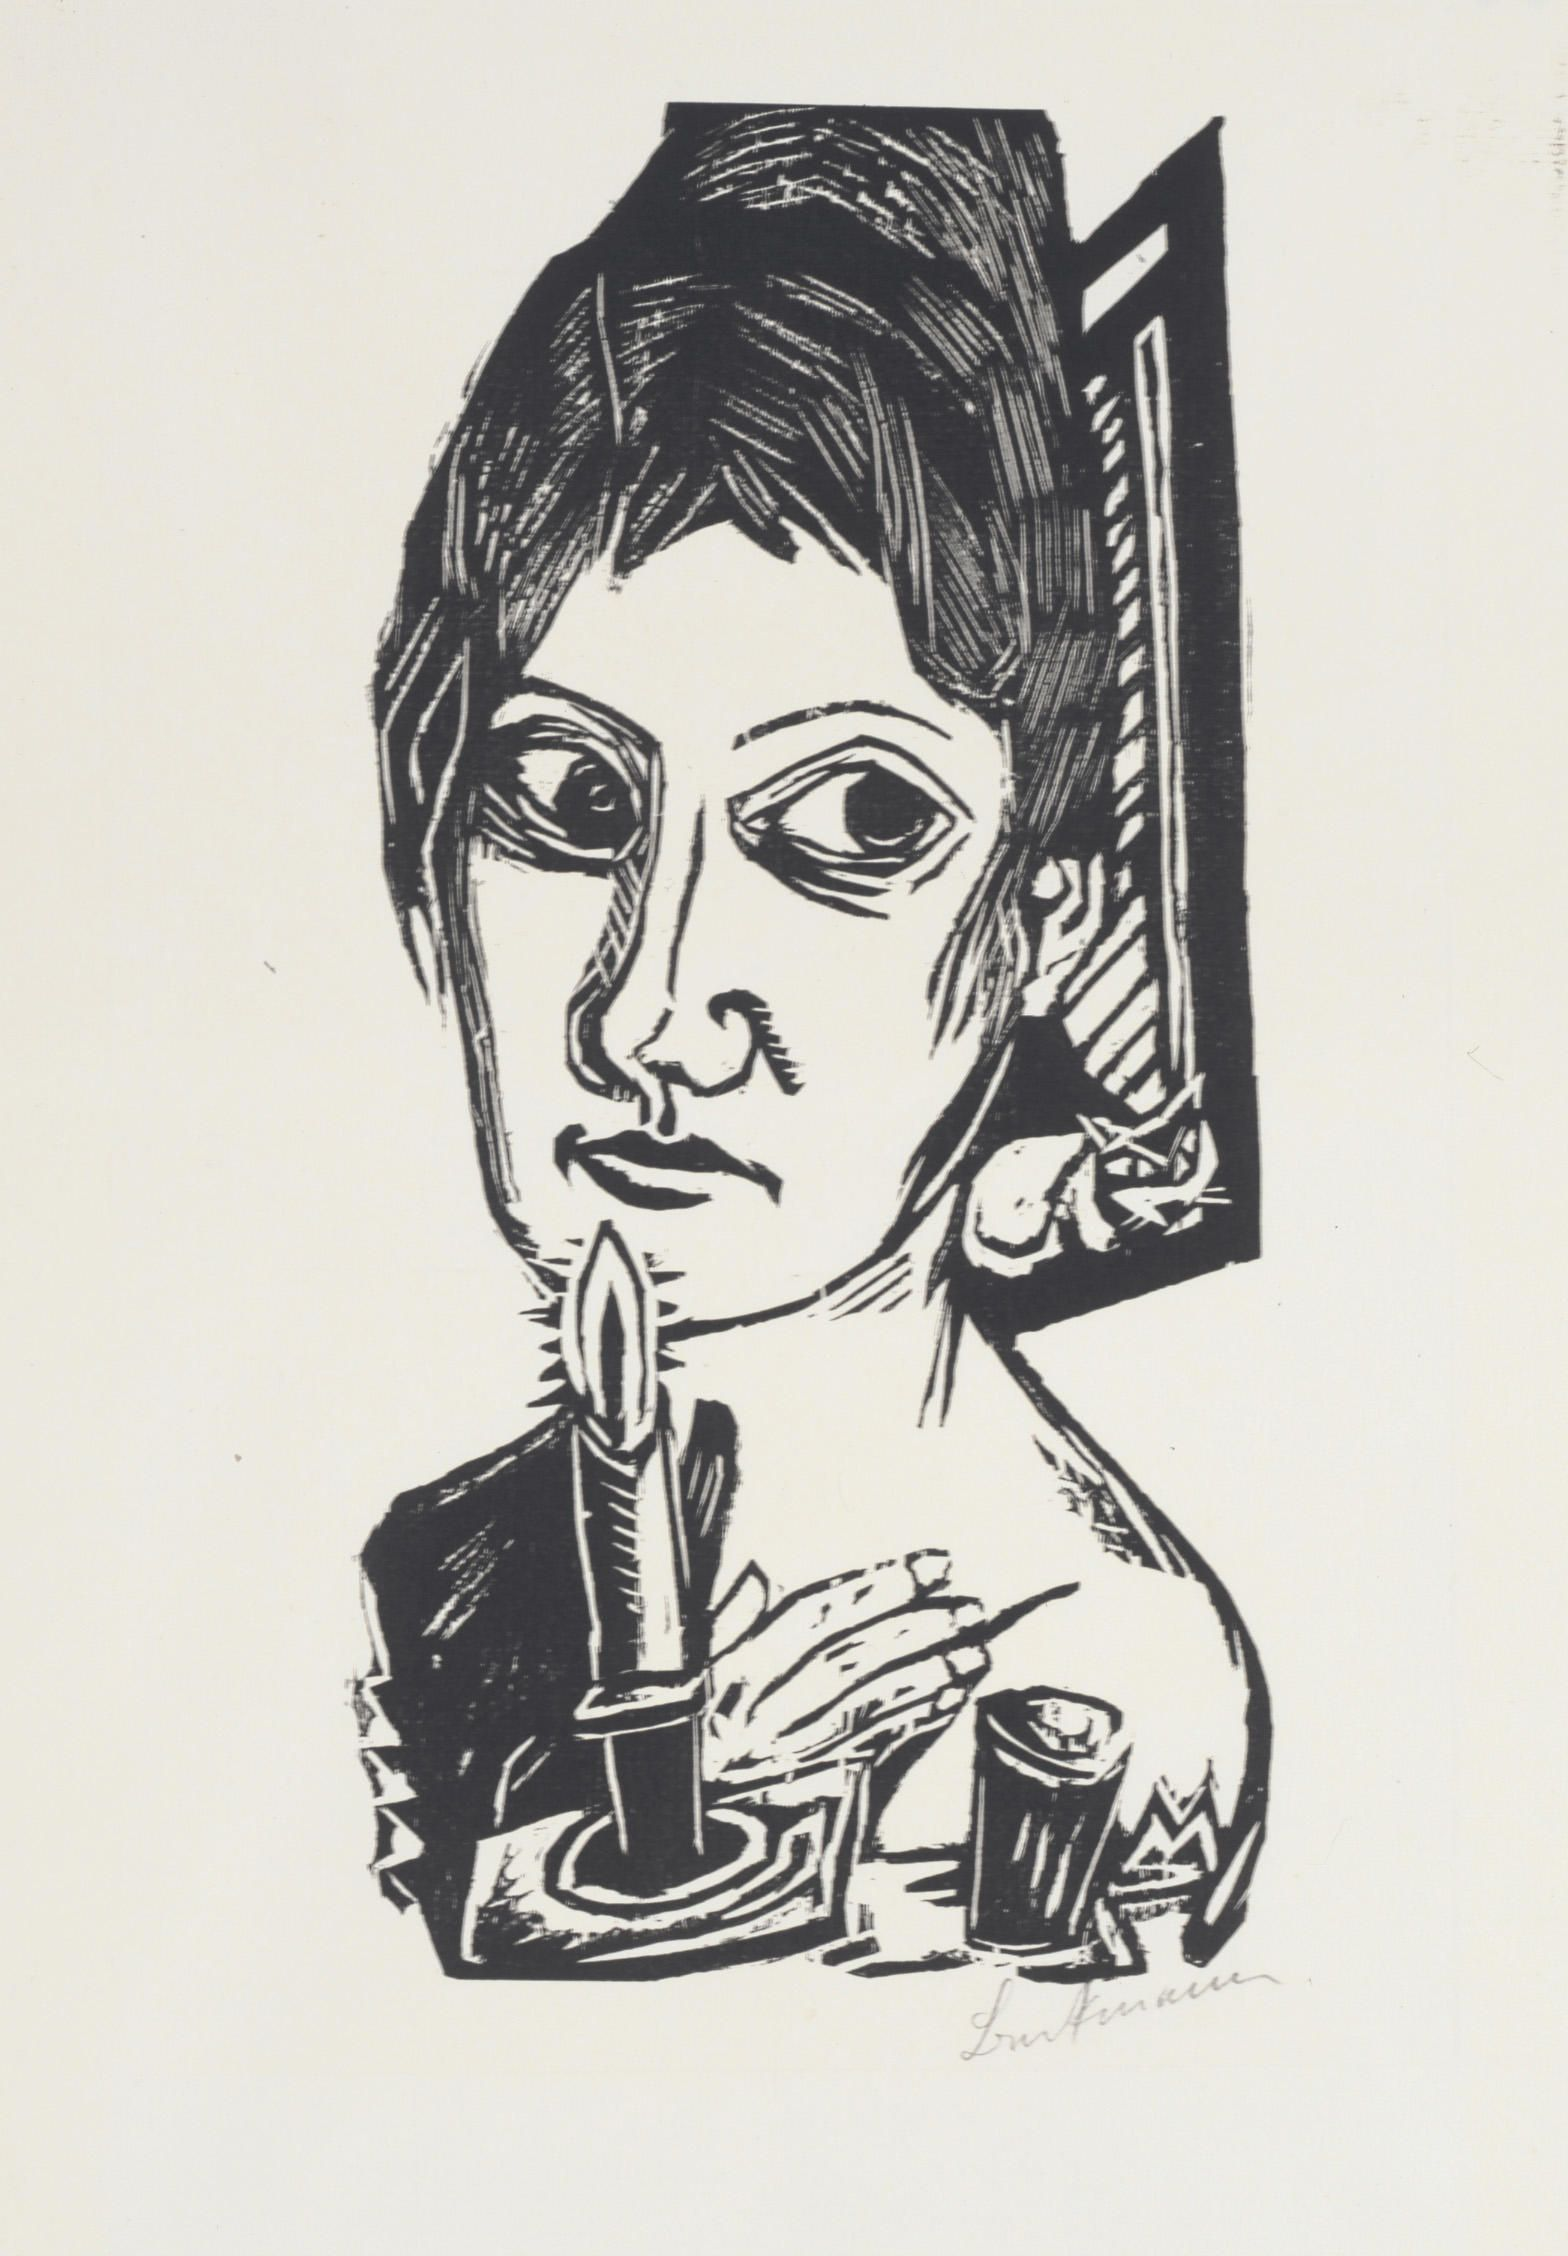 Max Beckmann, woodcut